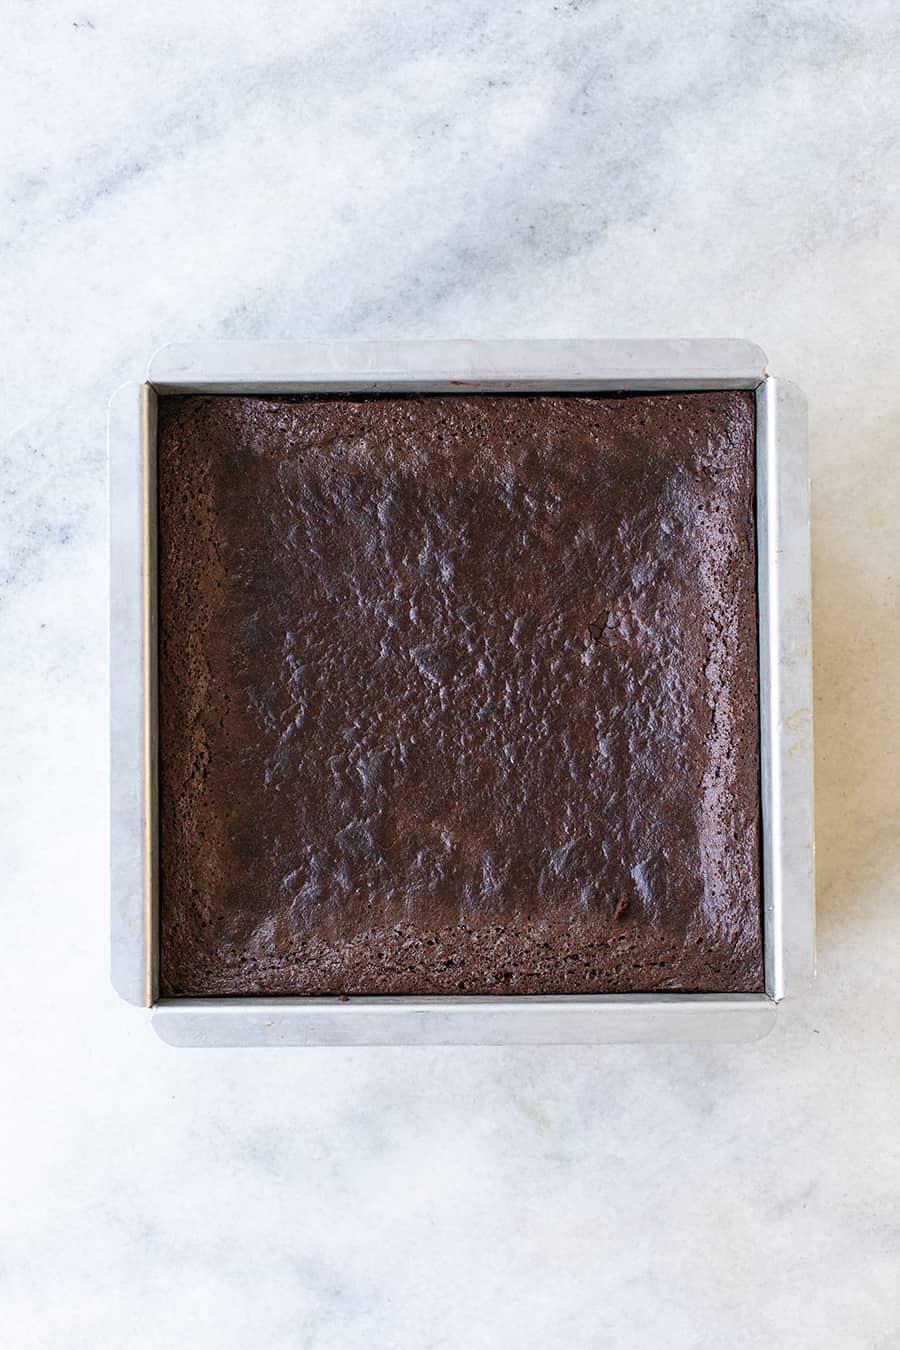 top down shot of gluten free chocolate brownies